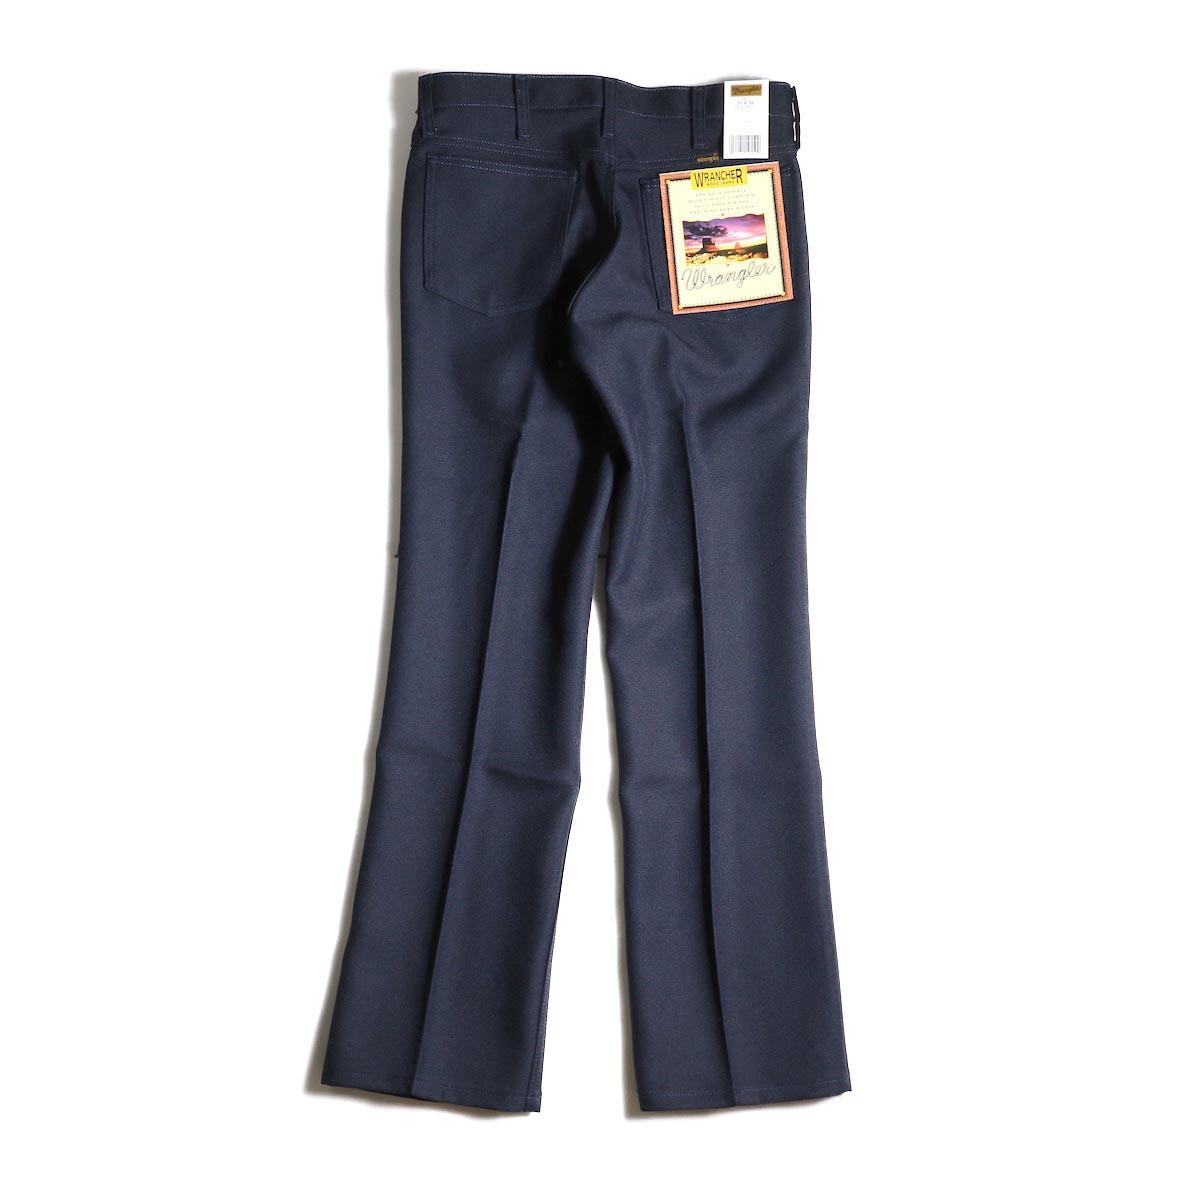 Wrangler / WRANCHER DRESS JEANS (Navy)背面